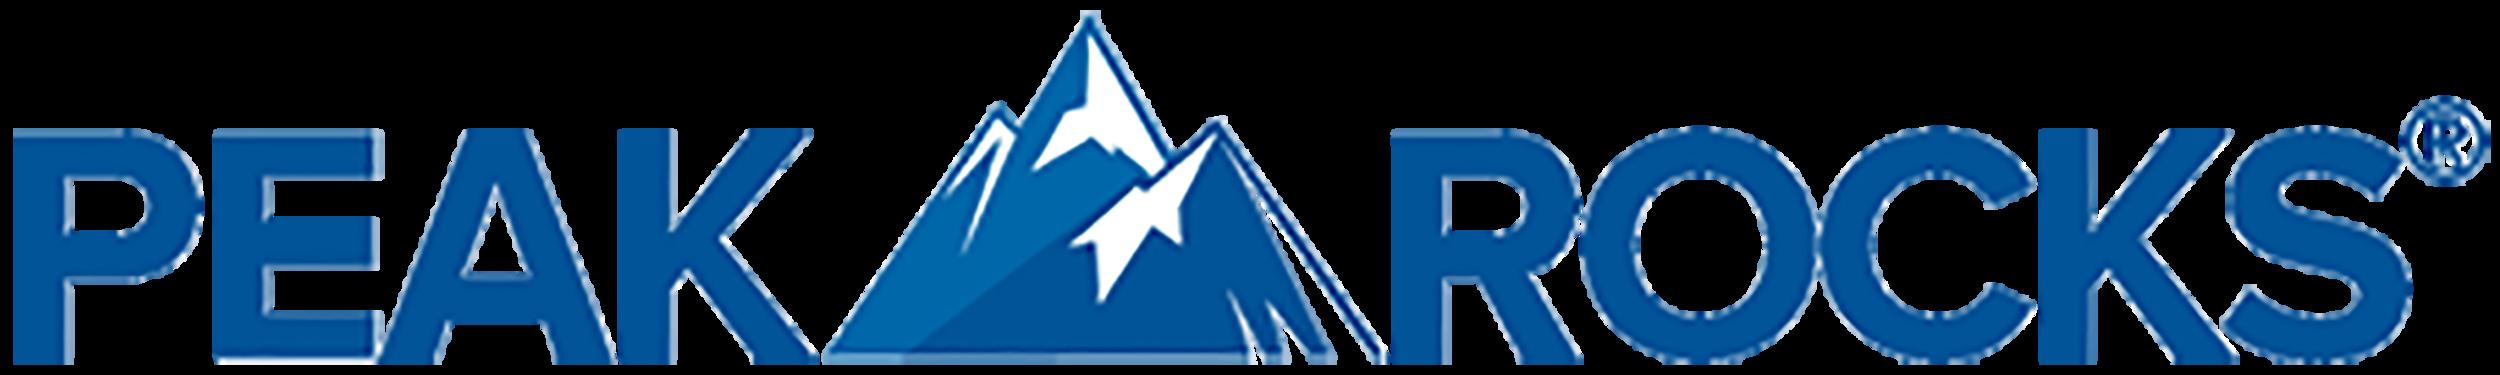 PeakRocks logo3.png